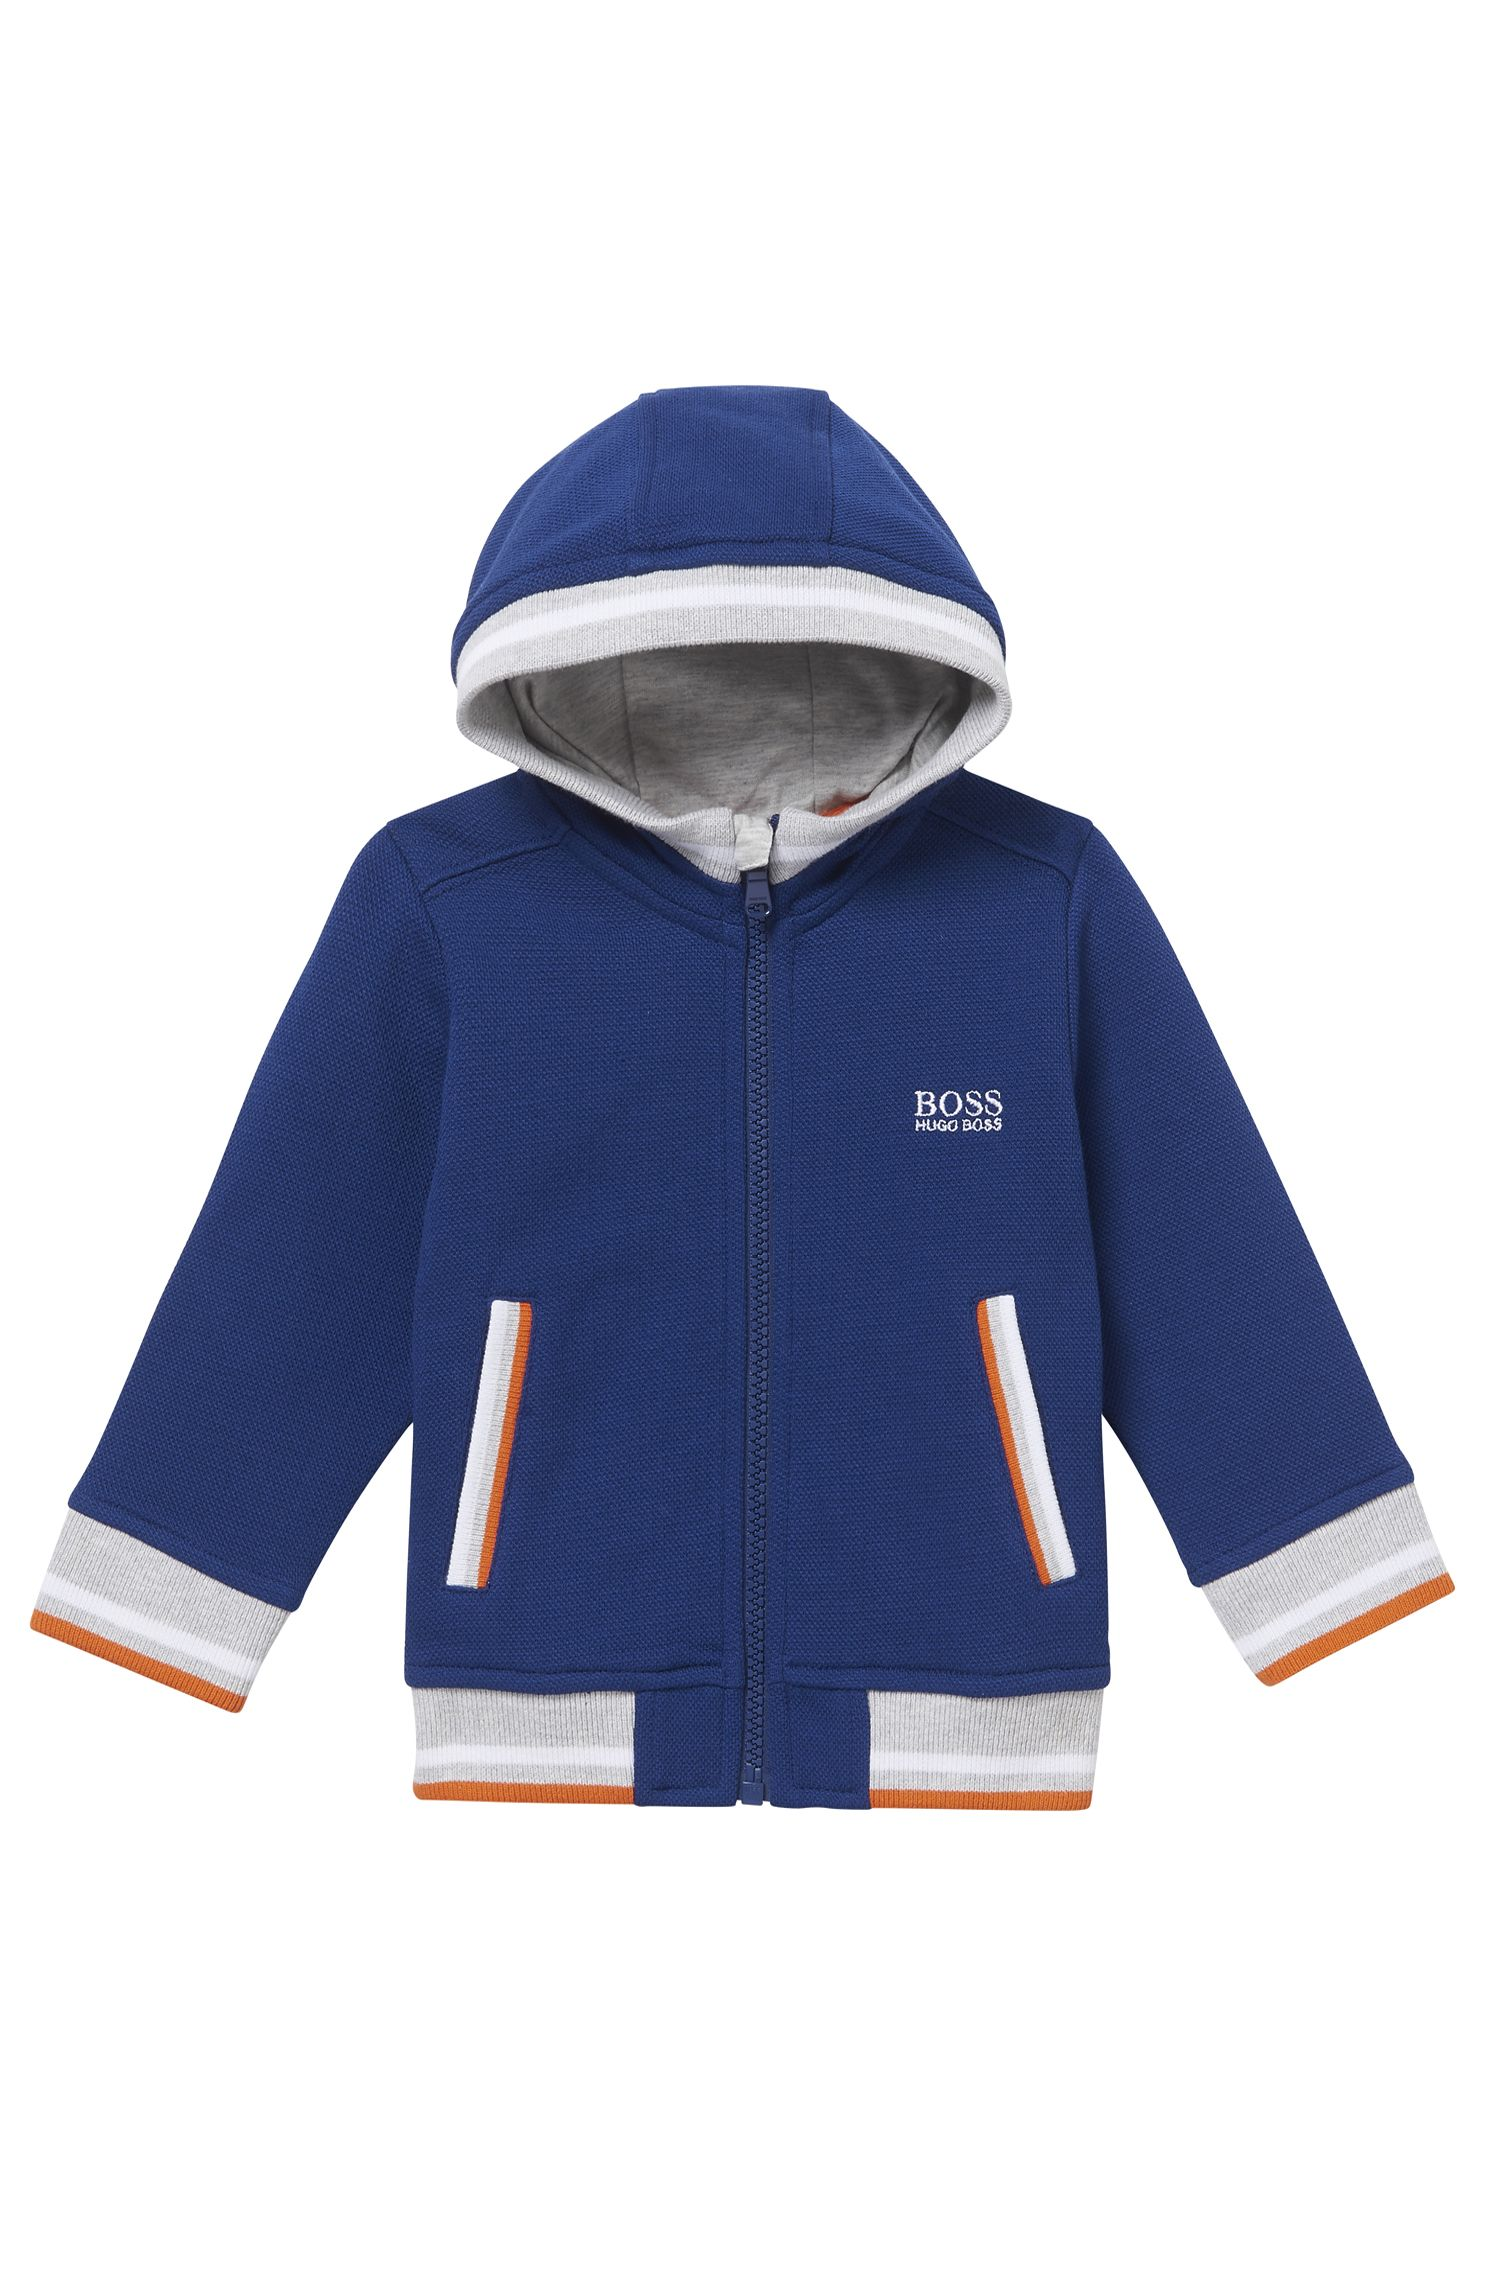 'J05521' | Toddler Stretch Cotton Blend Hood Sweat Jacket